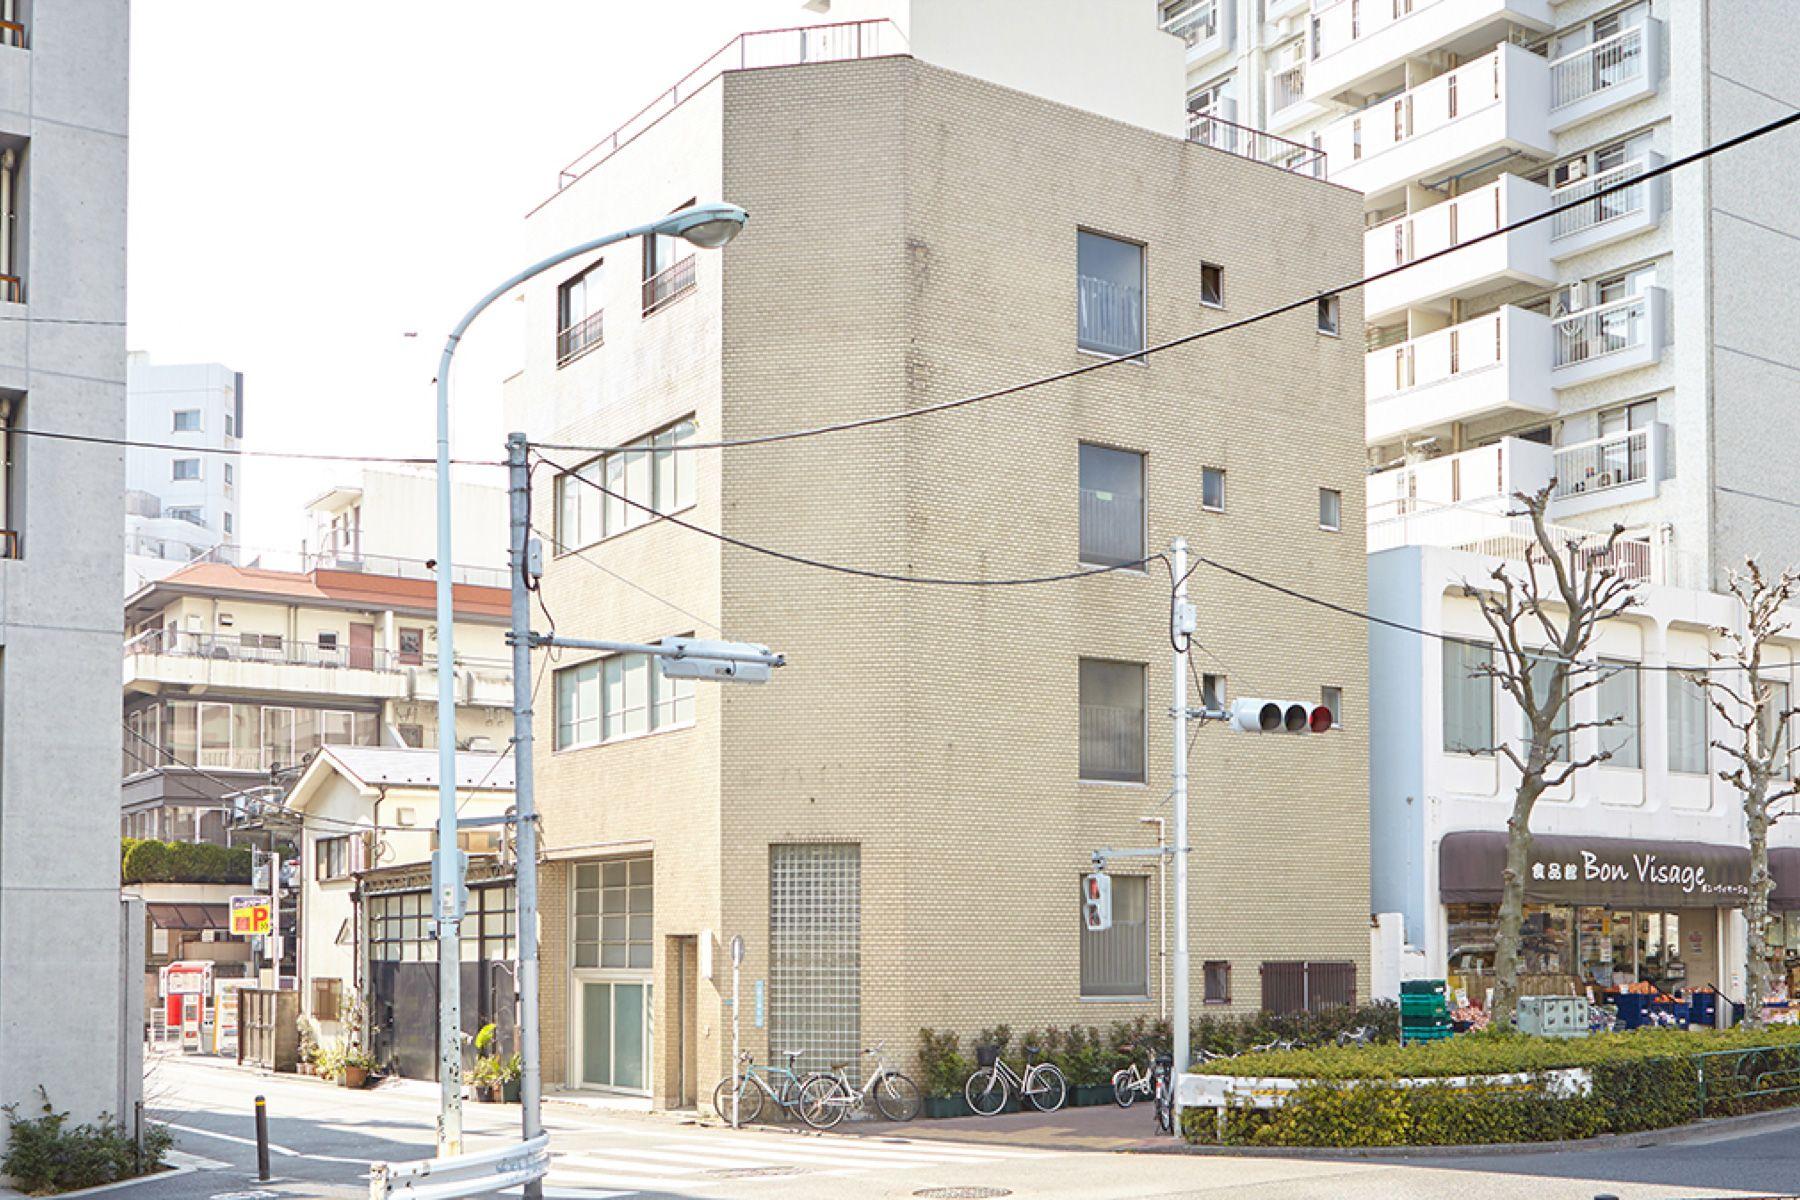 COSTA MESSA STUDIO 青葉台 (コスタメサスタジオ)スタジオ建物外観